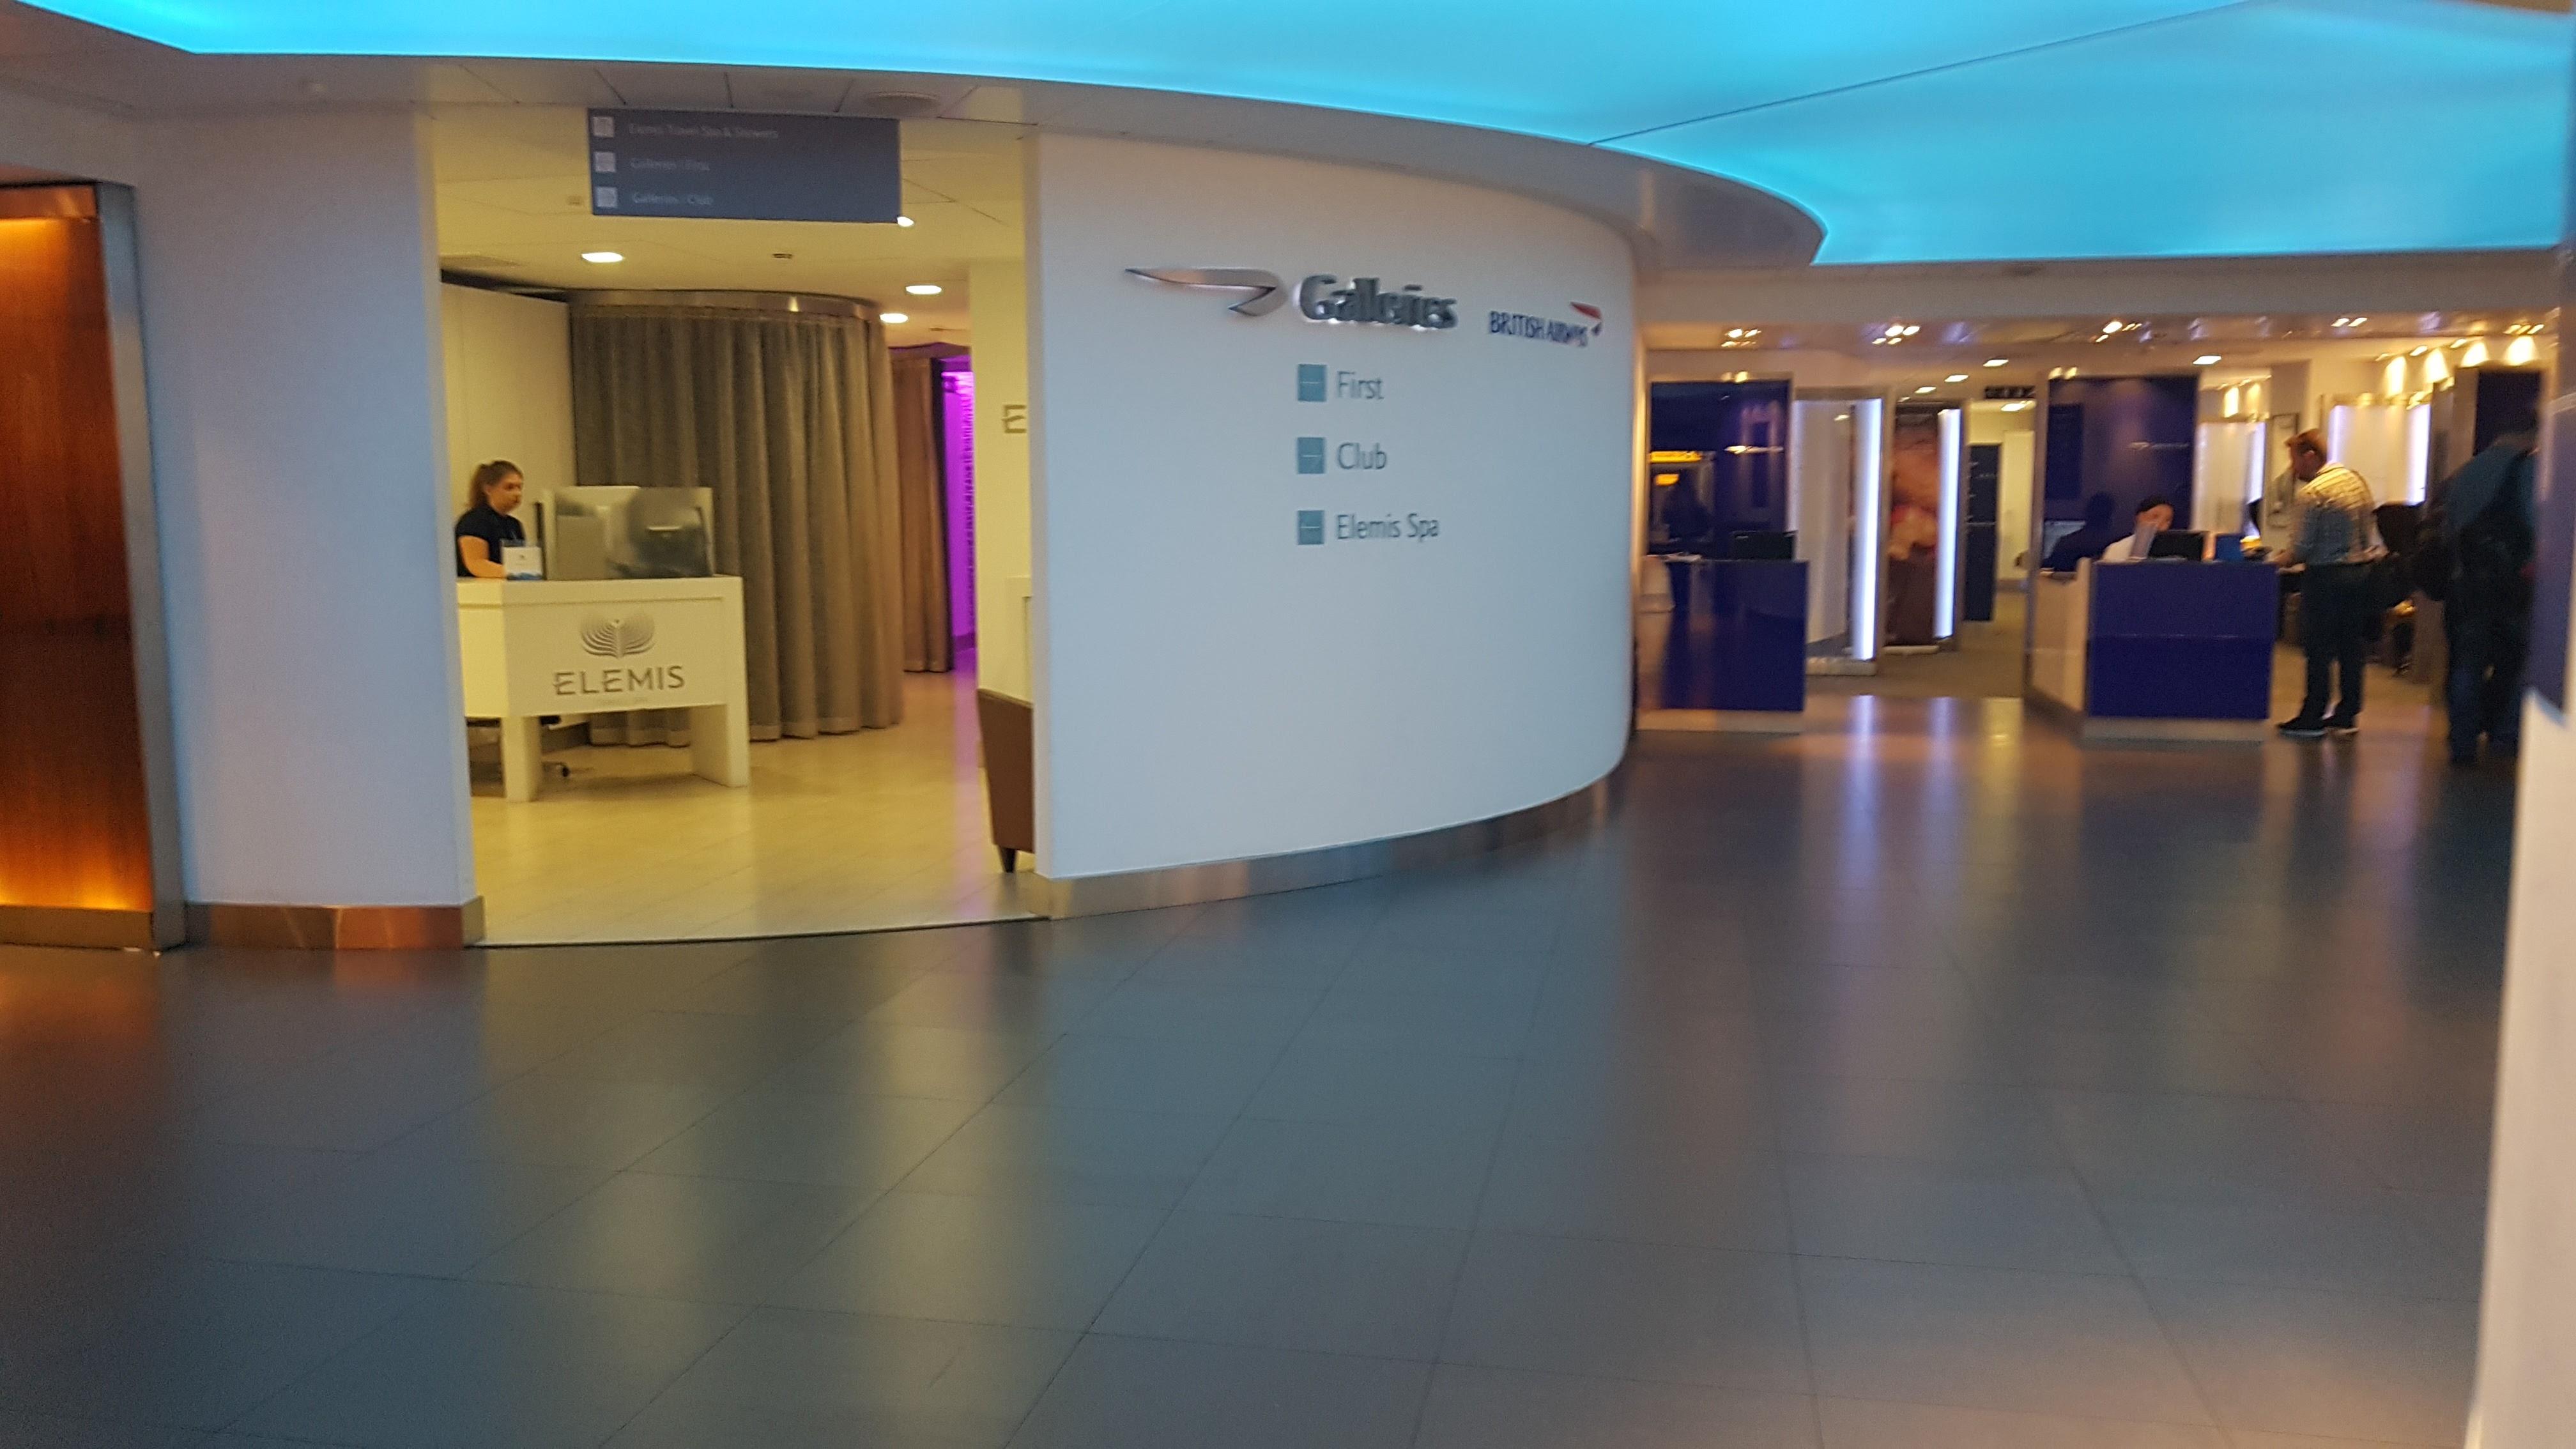 Ba Lounge Terminal 3 >> Review Galleries First Lounge London Heathrow Terminal 3